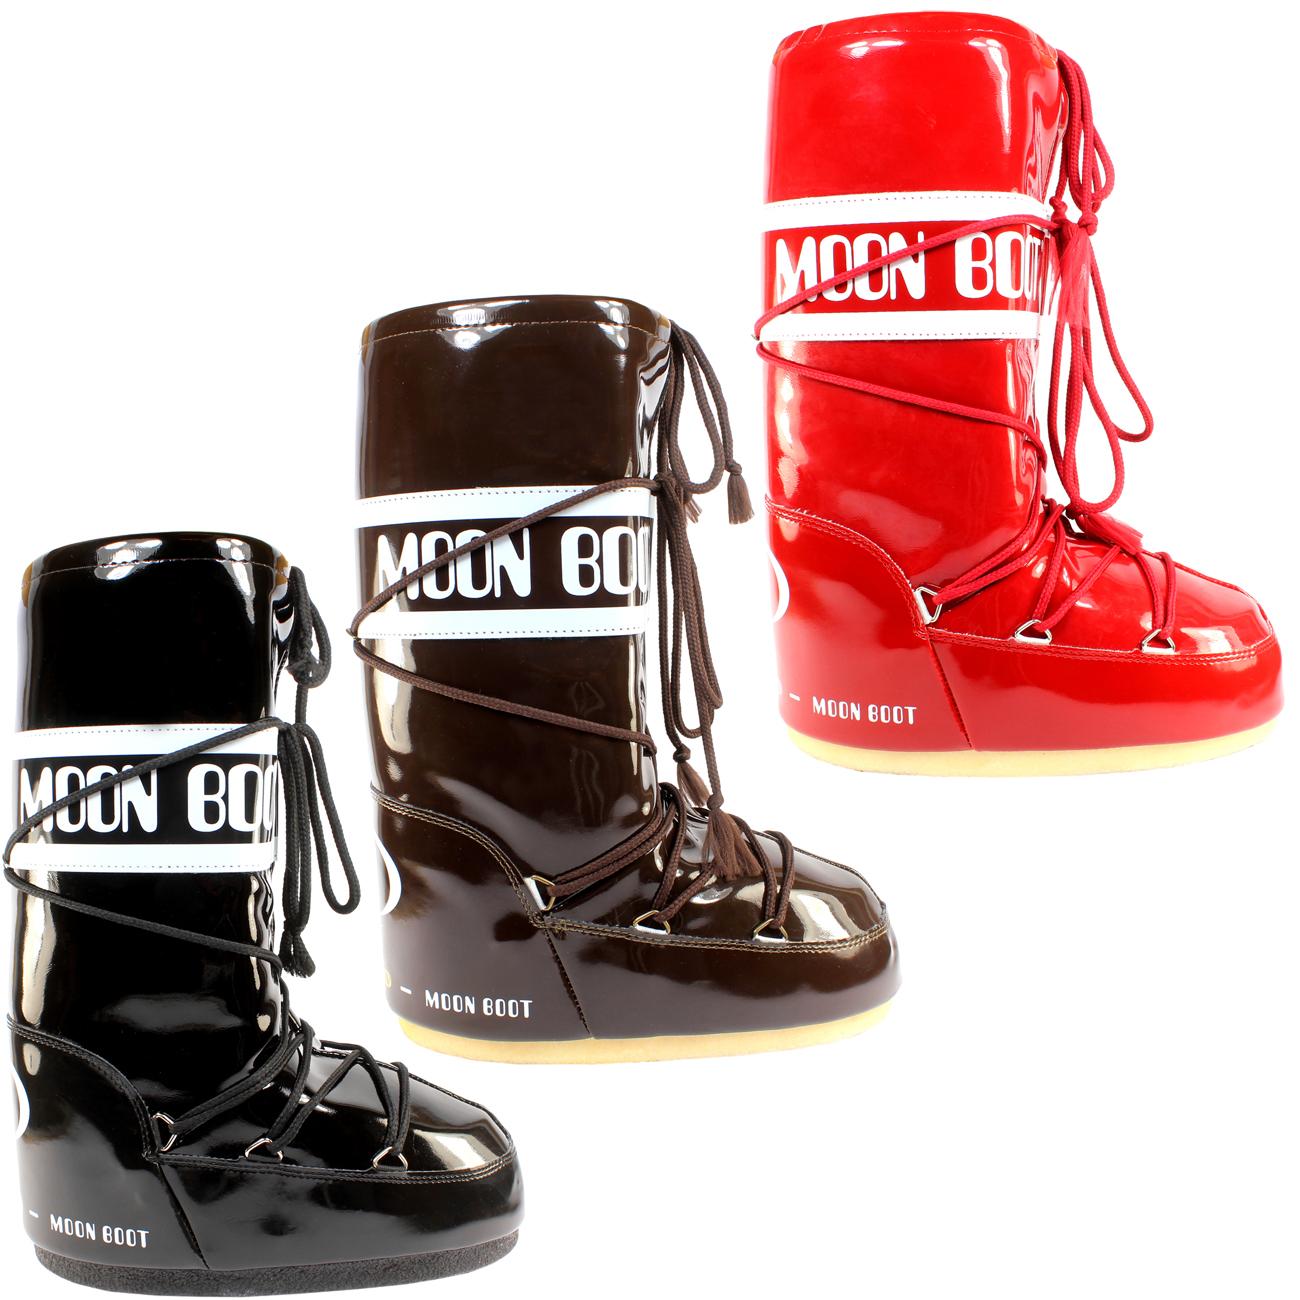 womens tecnica moon boot vinyl winter snow ski sking boots. Black Bedroom Furniture Sets. Home Design Ideas